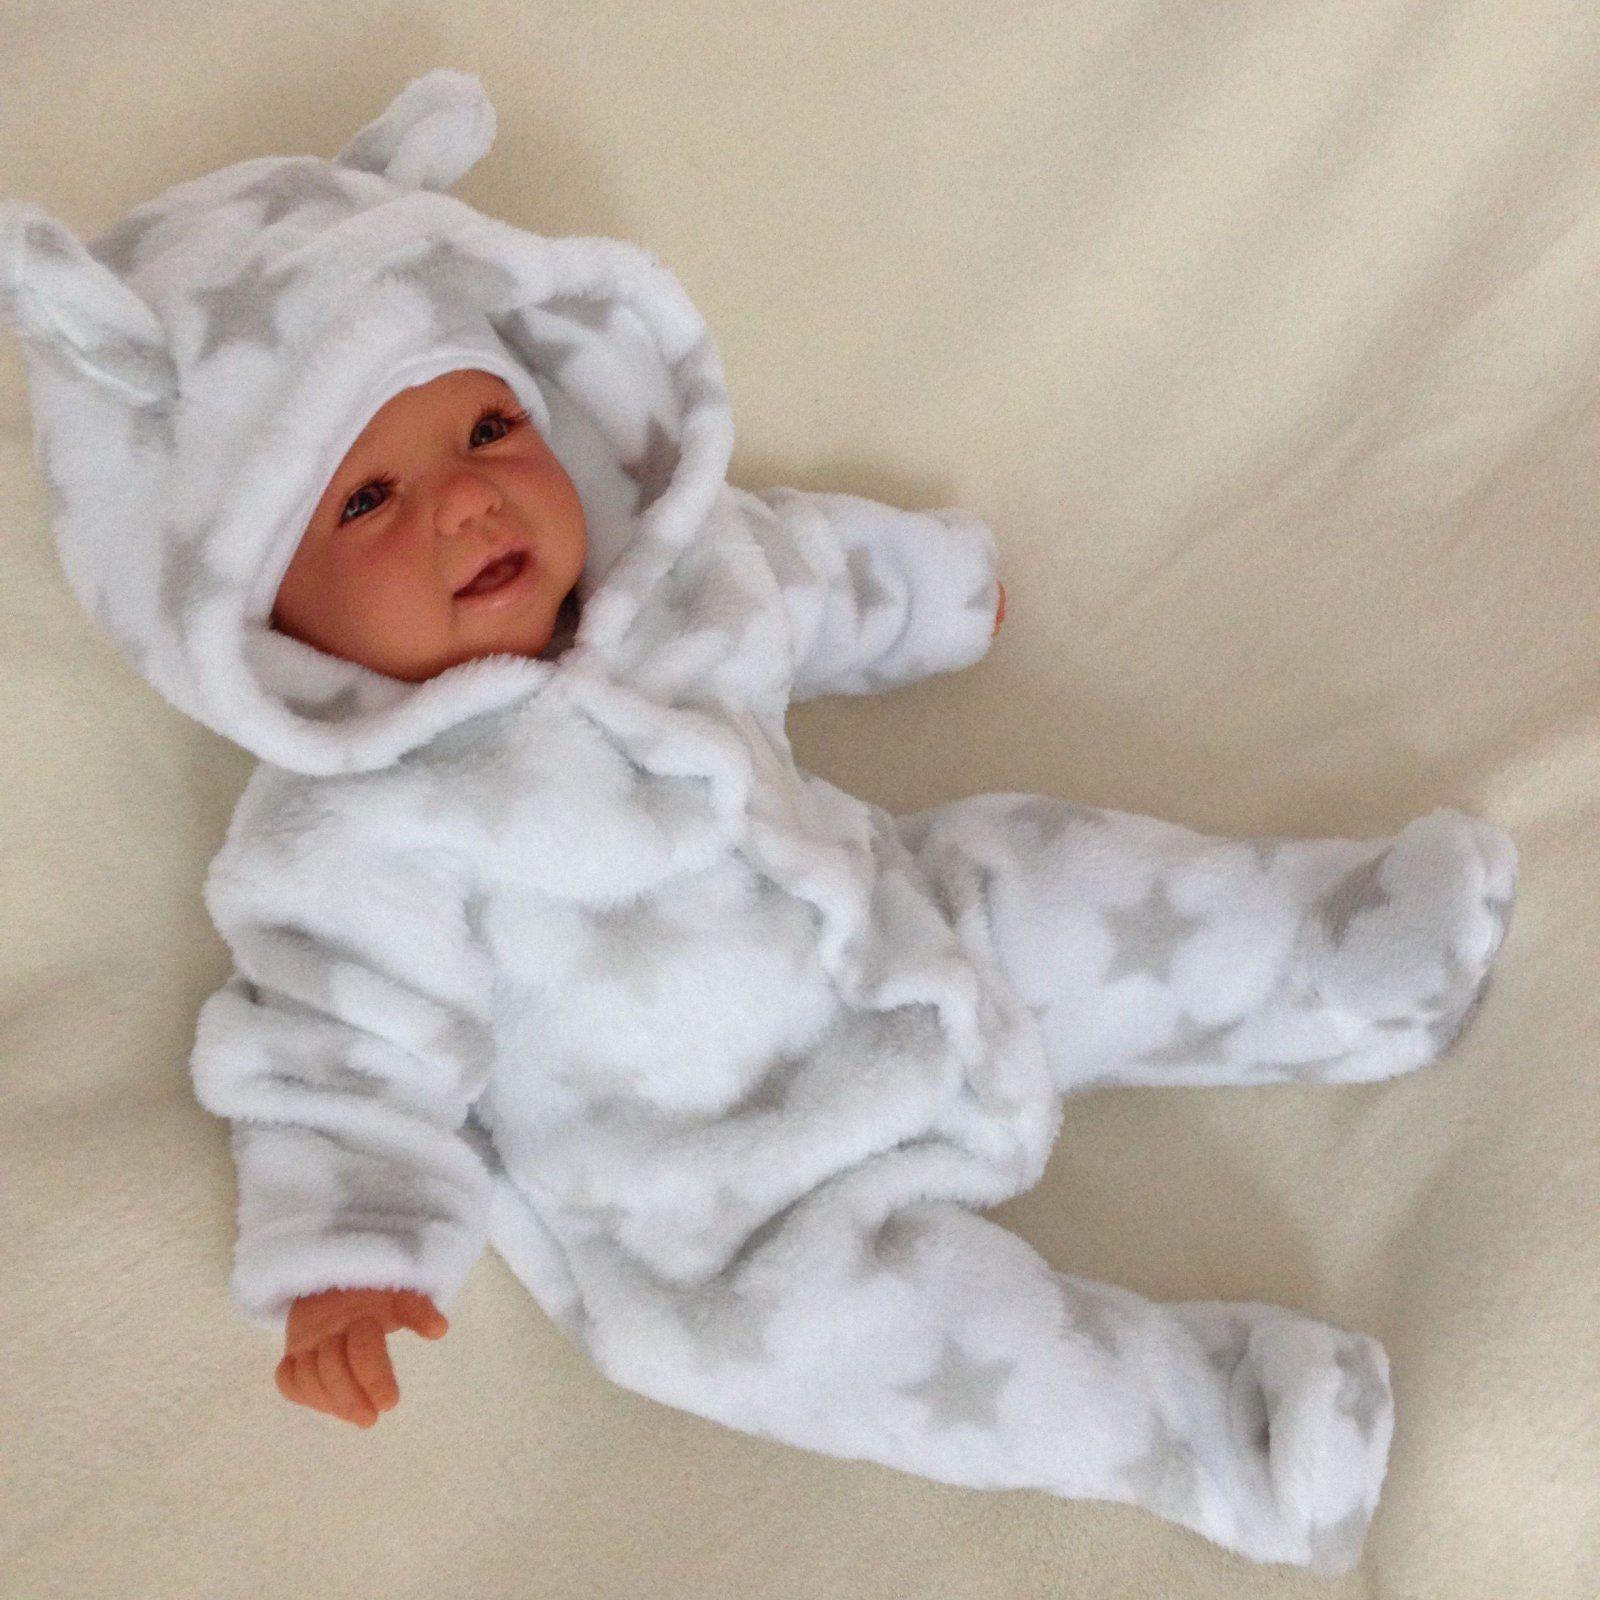 NEU Baby Mädchen Jungen Strampler Kapuzen-Strampler Overall Sterne 50 56 62 68